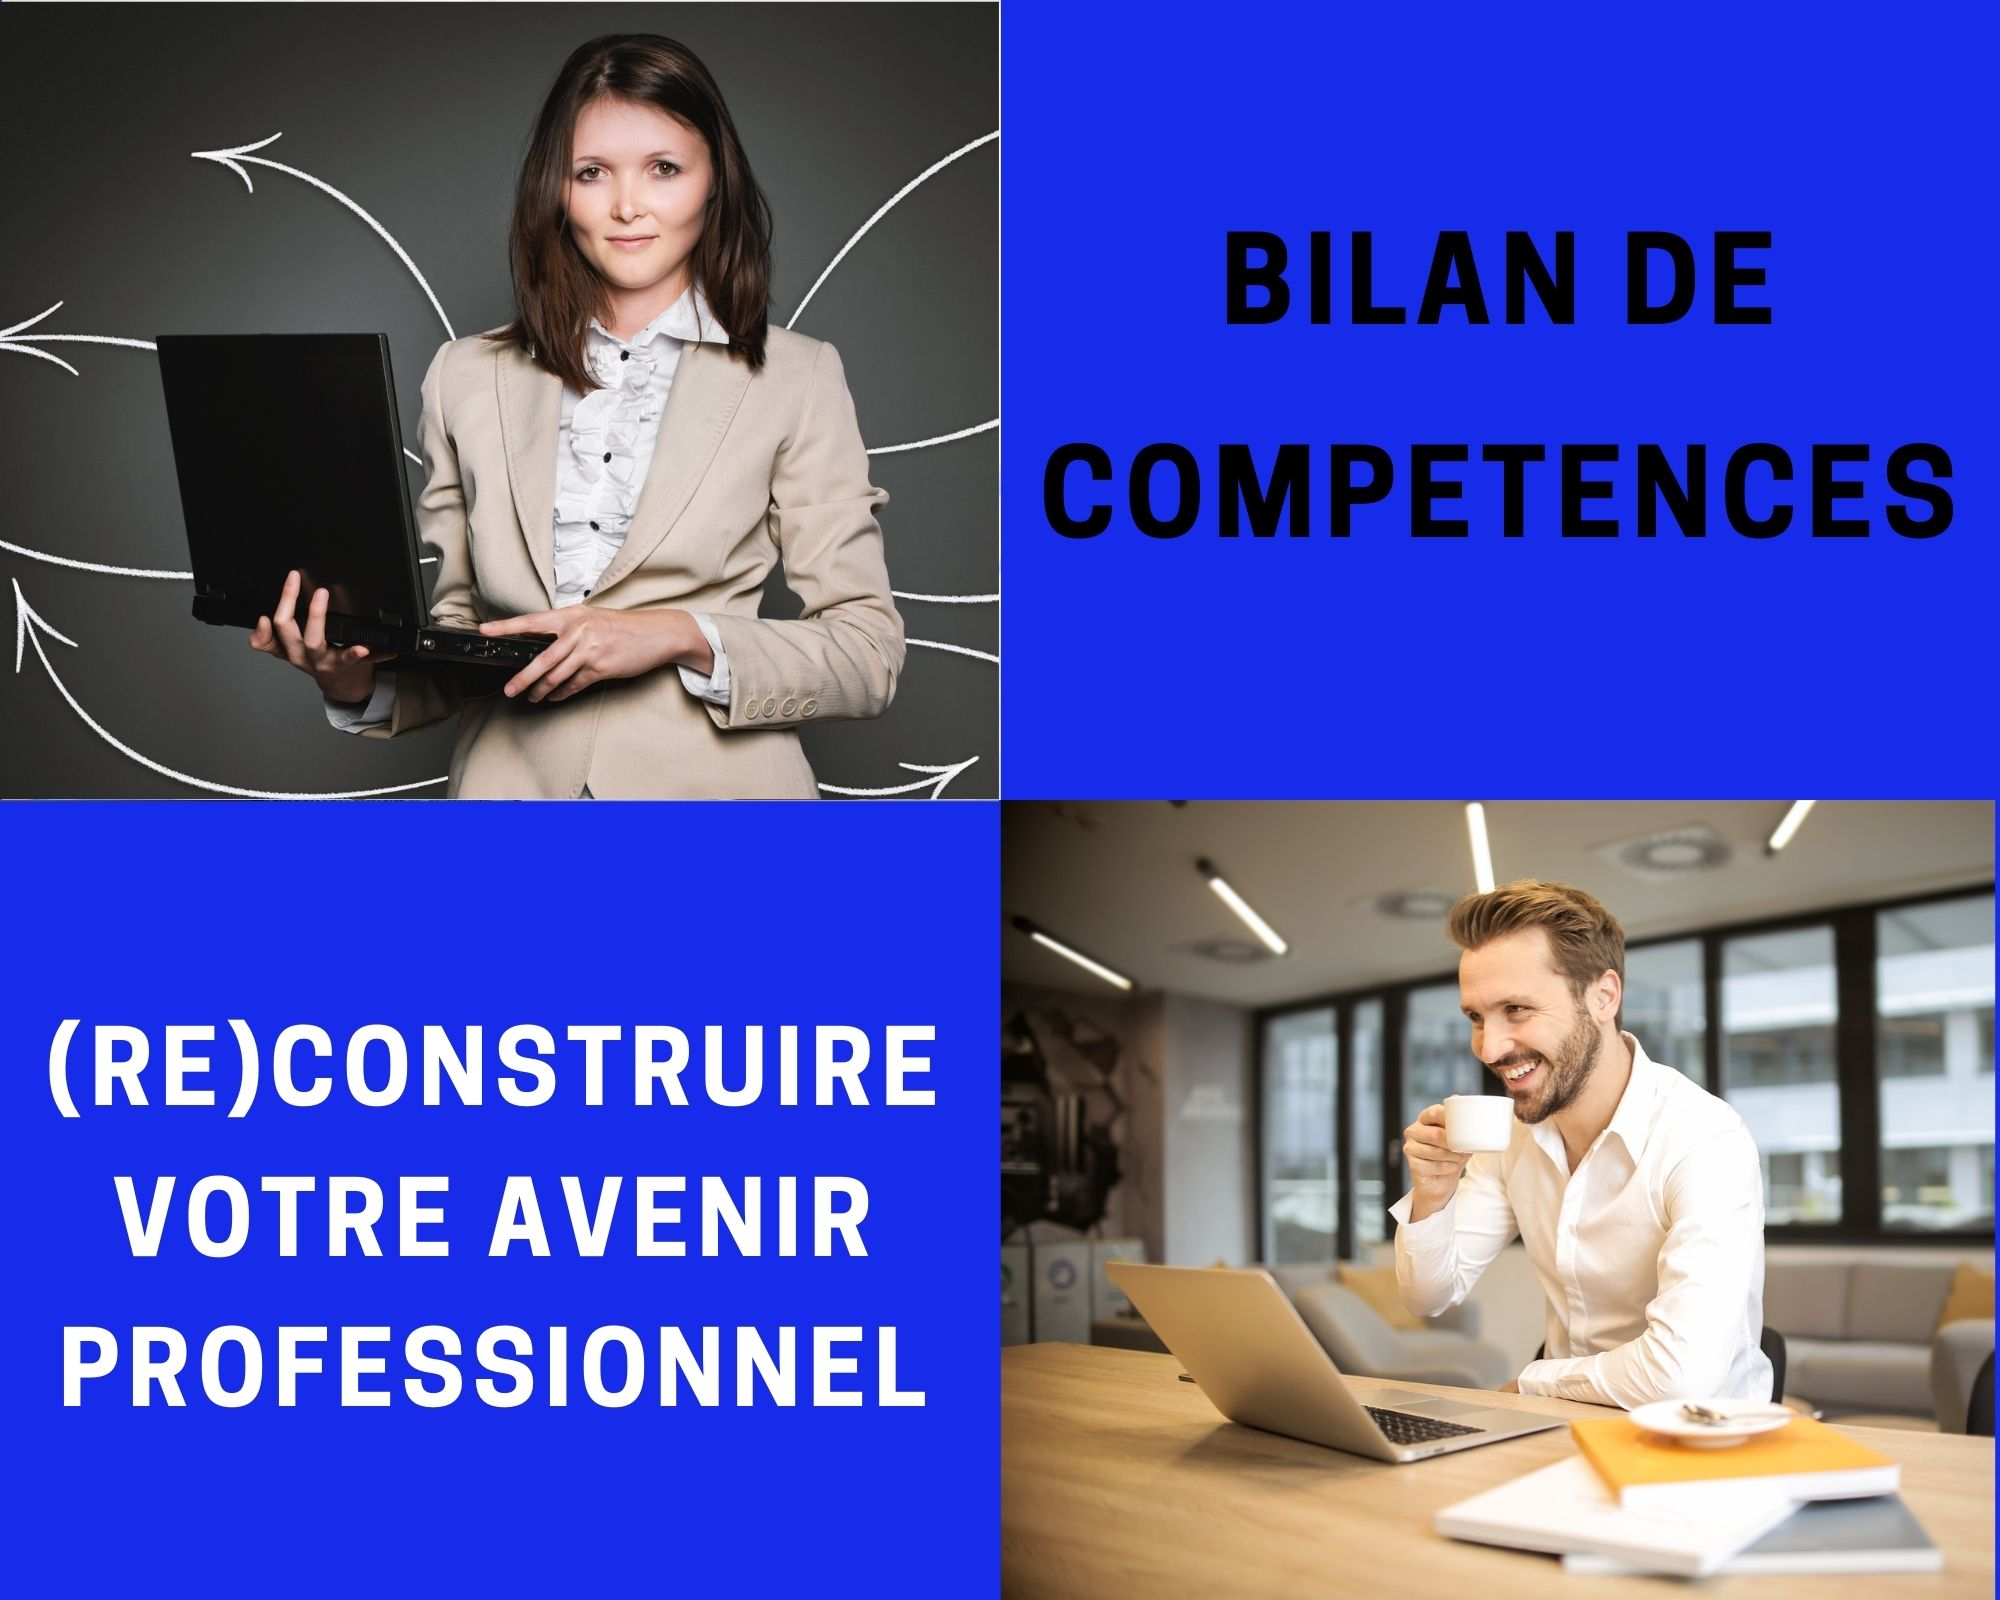 ✔ BILAN DE COMPÉTENCES